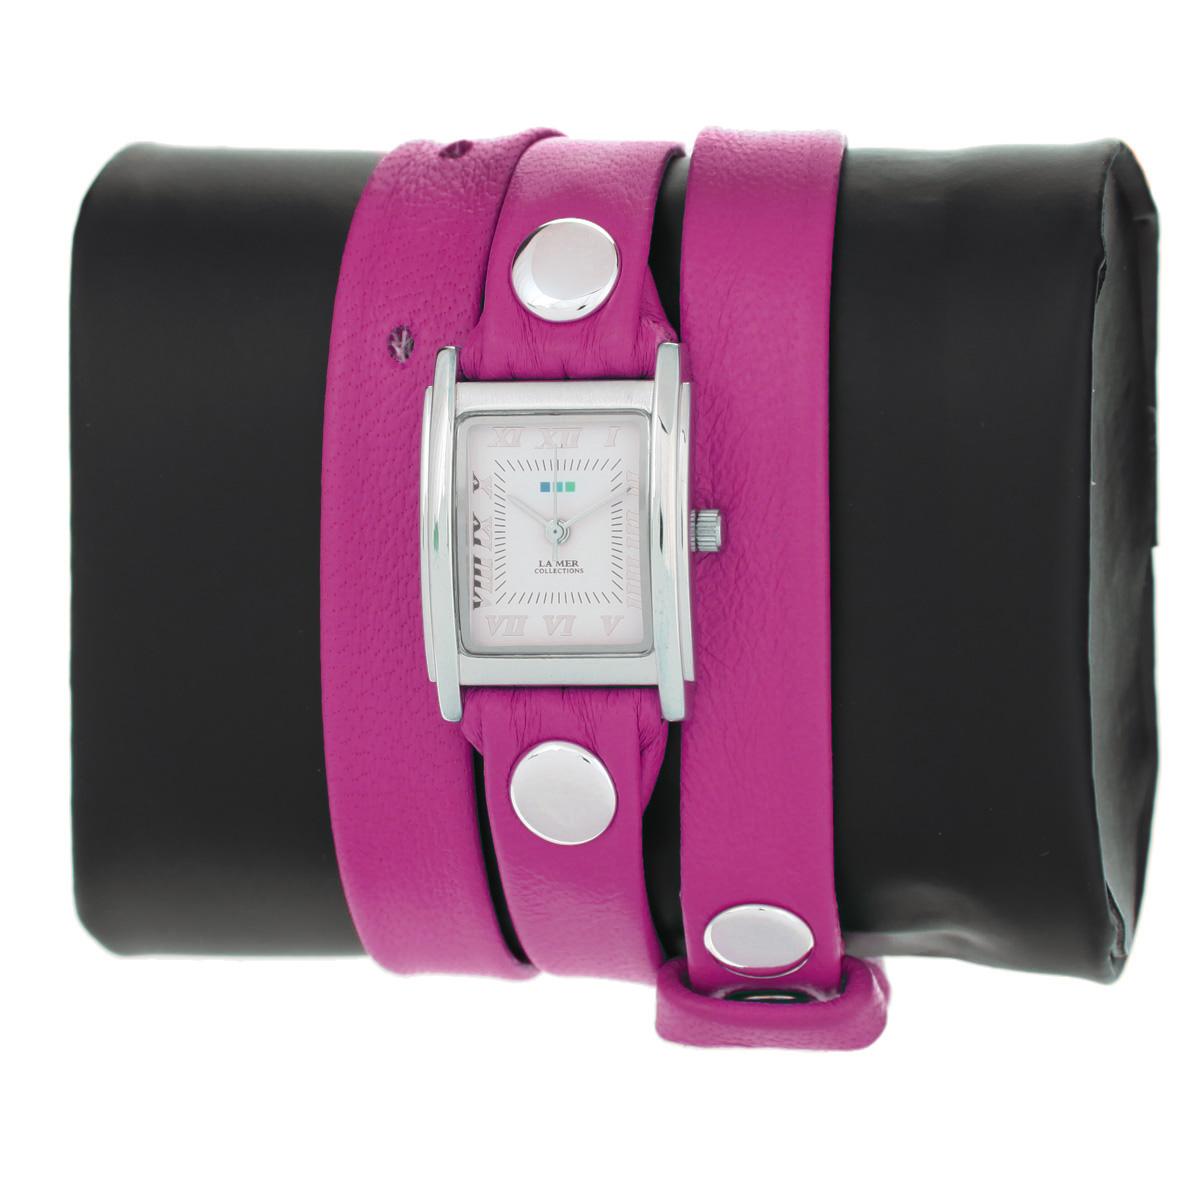 "Часы наручные женские La Mer Collections ""Simple Hot Pink Patent/Silver"". LMSTW1001x ( LMSTW1001x )"